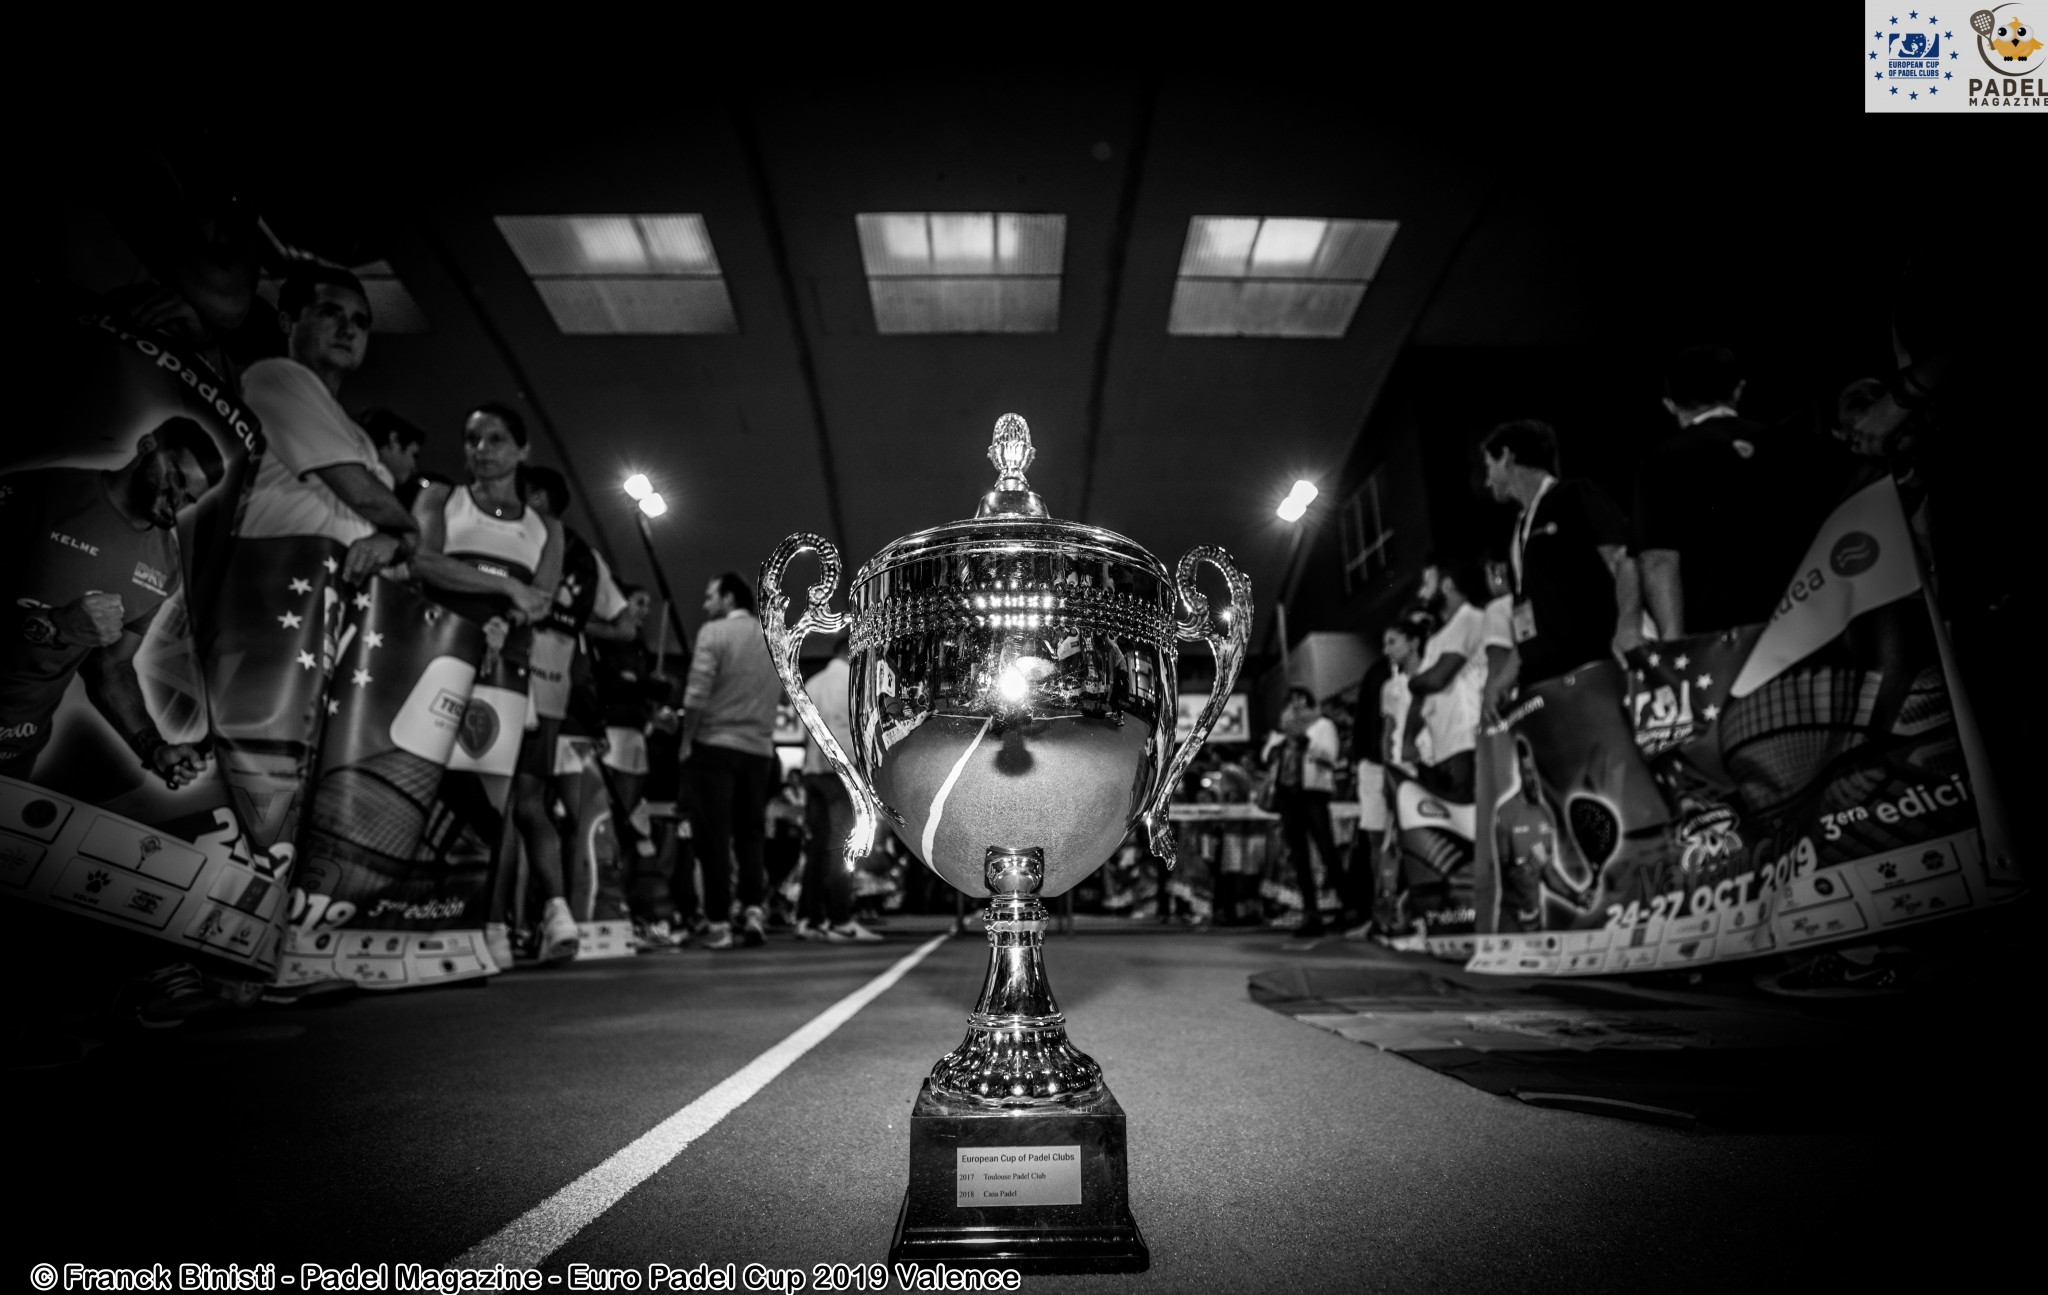 Euro Padel Cup – Résultats et programmes